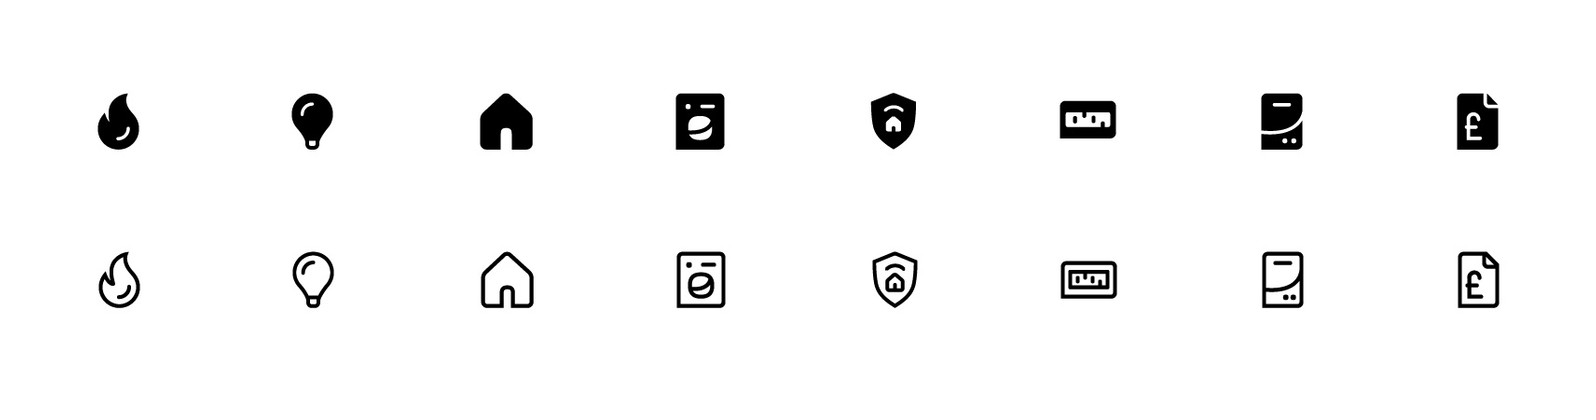 Nucleus icons